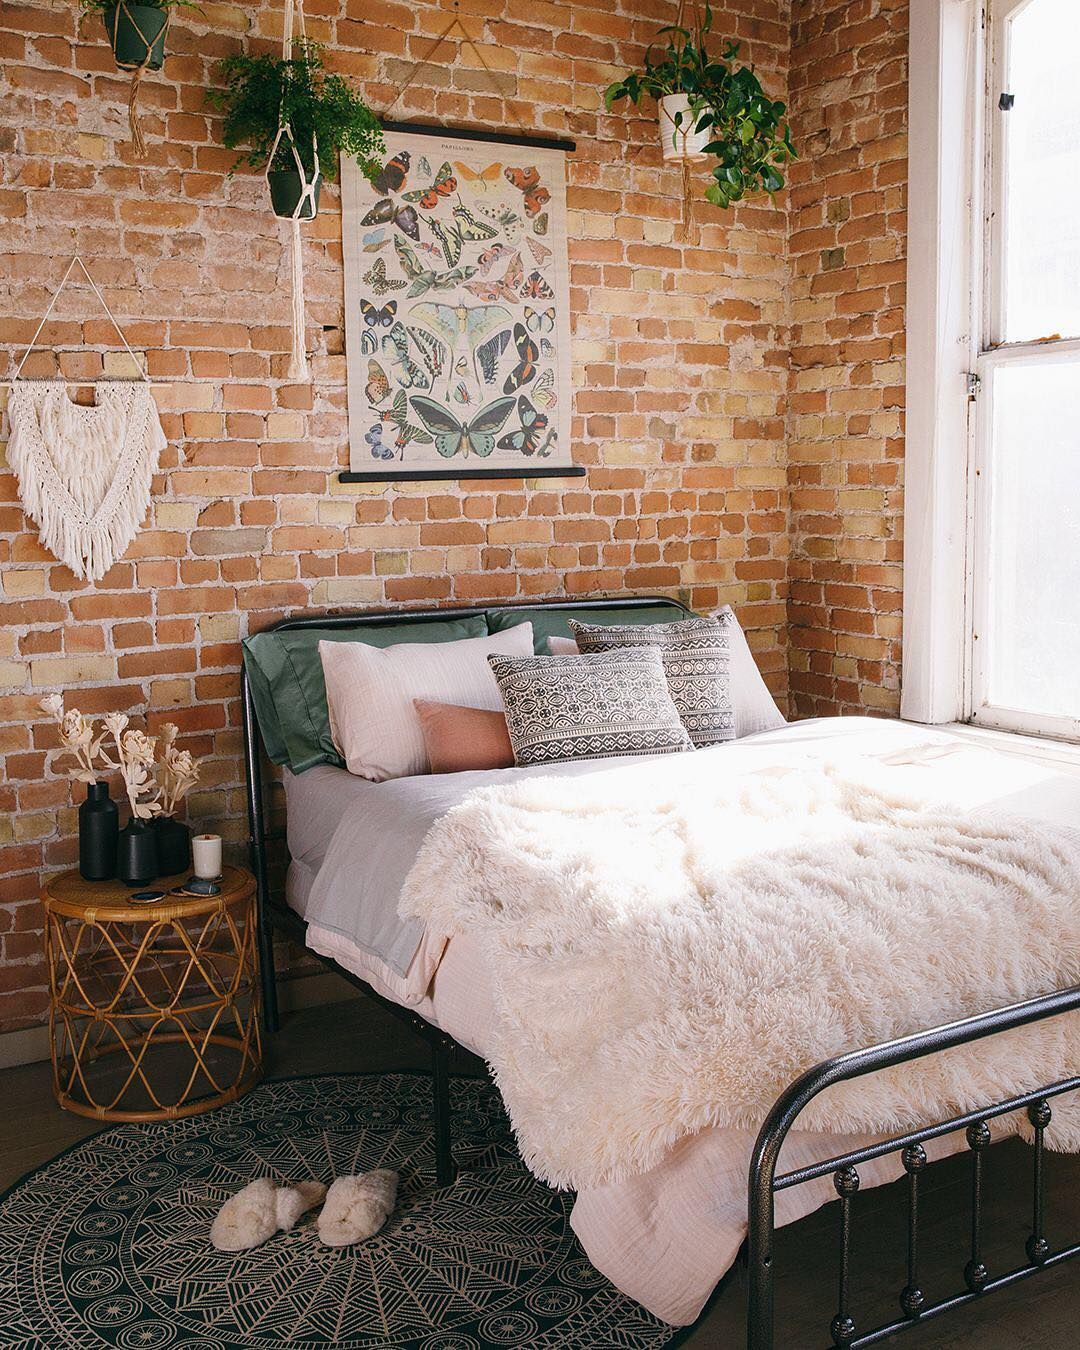 Interiordesign Home Bedroom Boho Homedecor Brick Wall